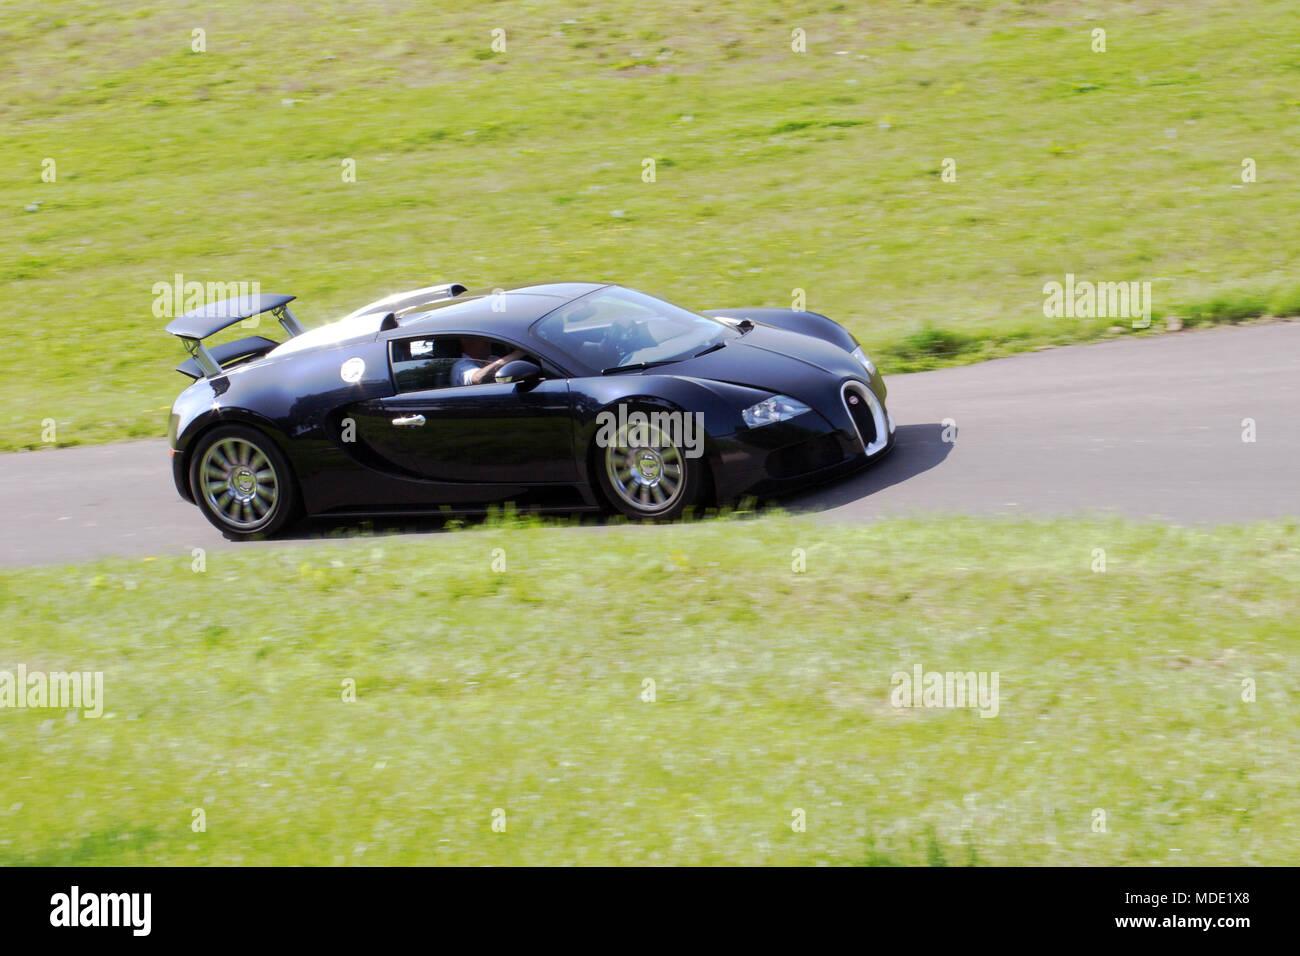 Black Bugatti Veyron Million £ Pound Hyper Car Hypercar Driving Fast On A  Country Road.